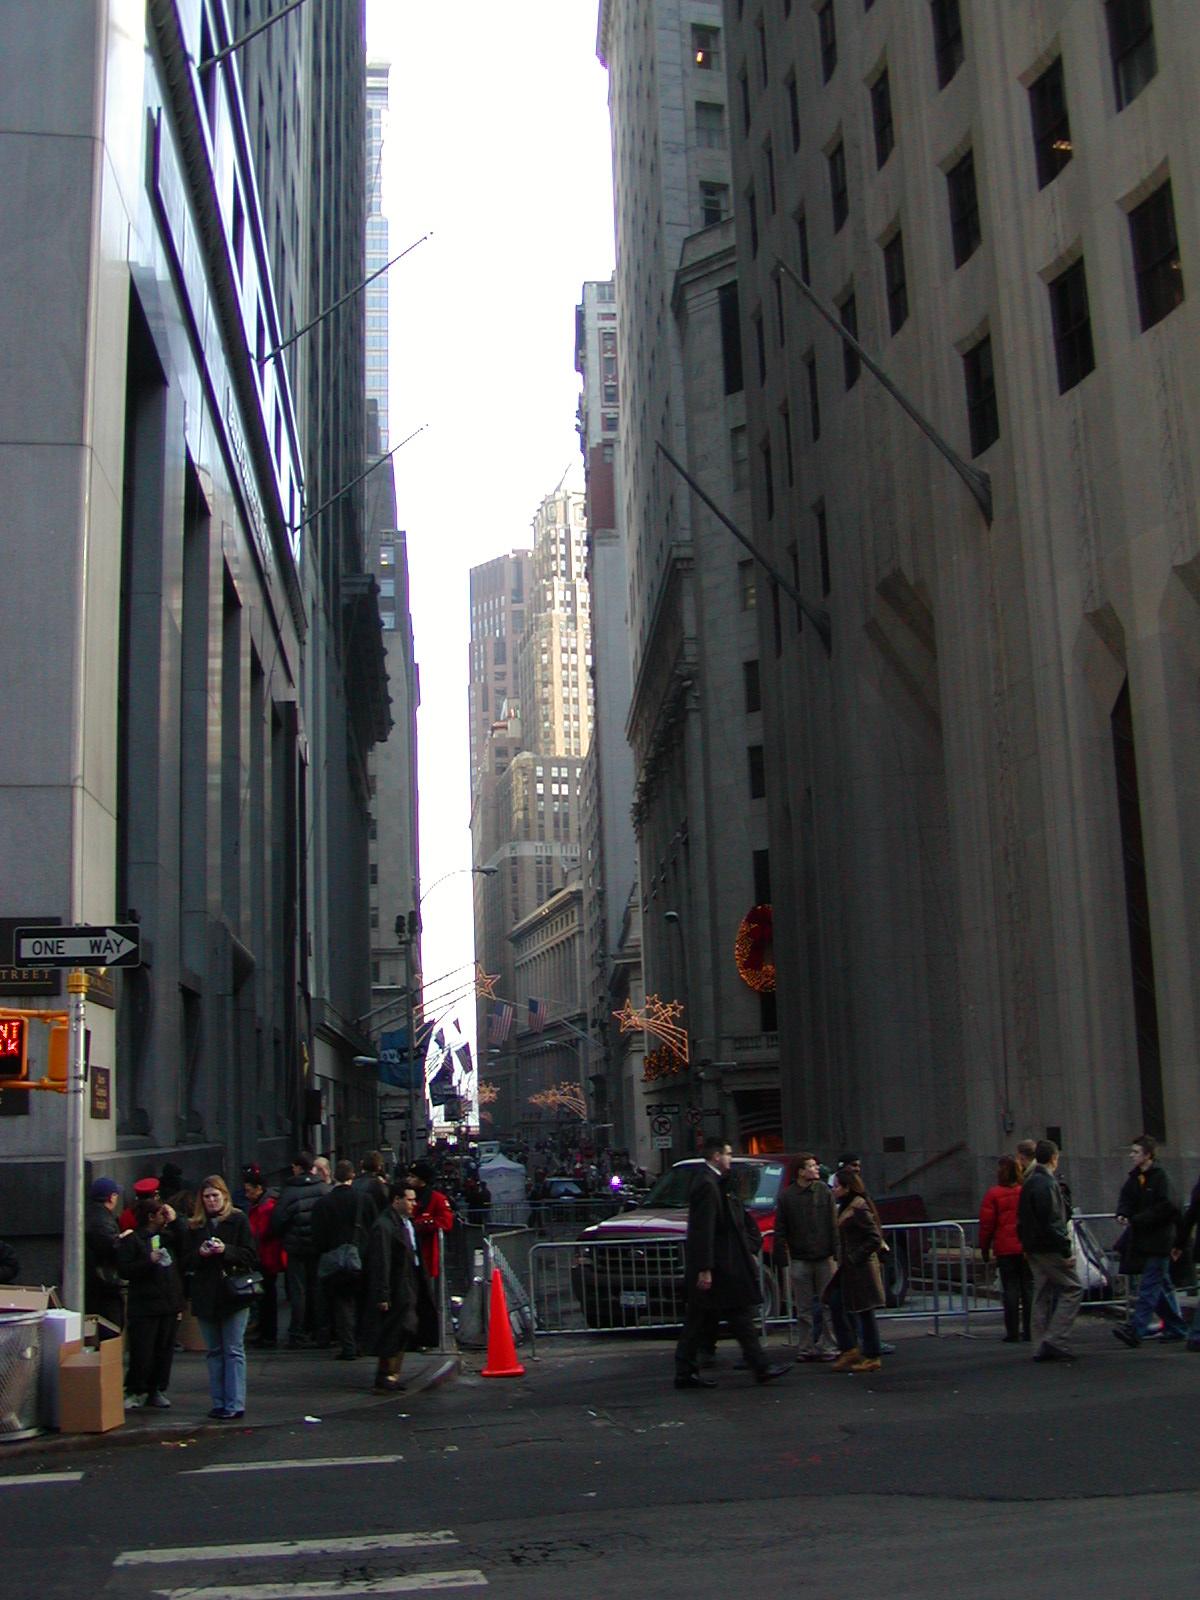 New York City - 2002-12-31-133750